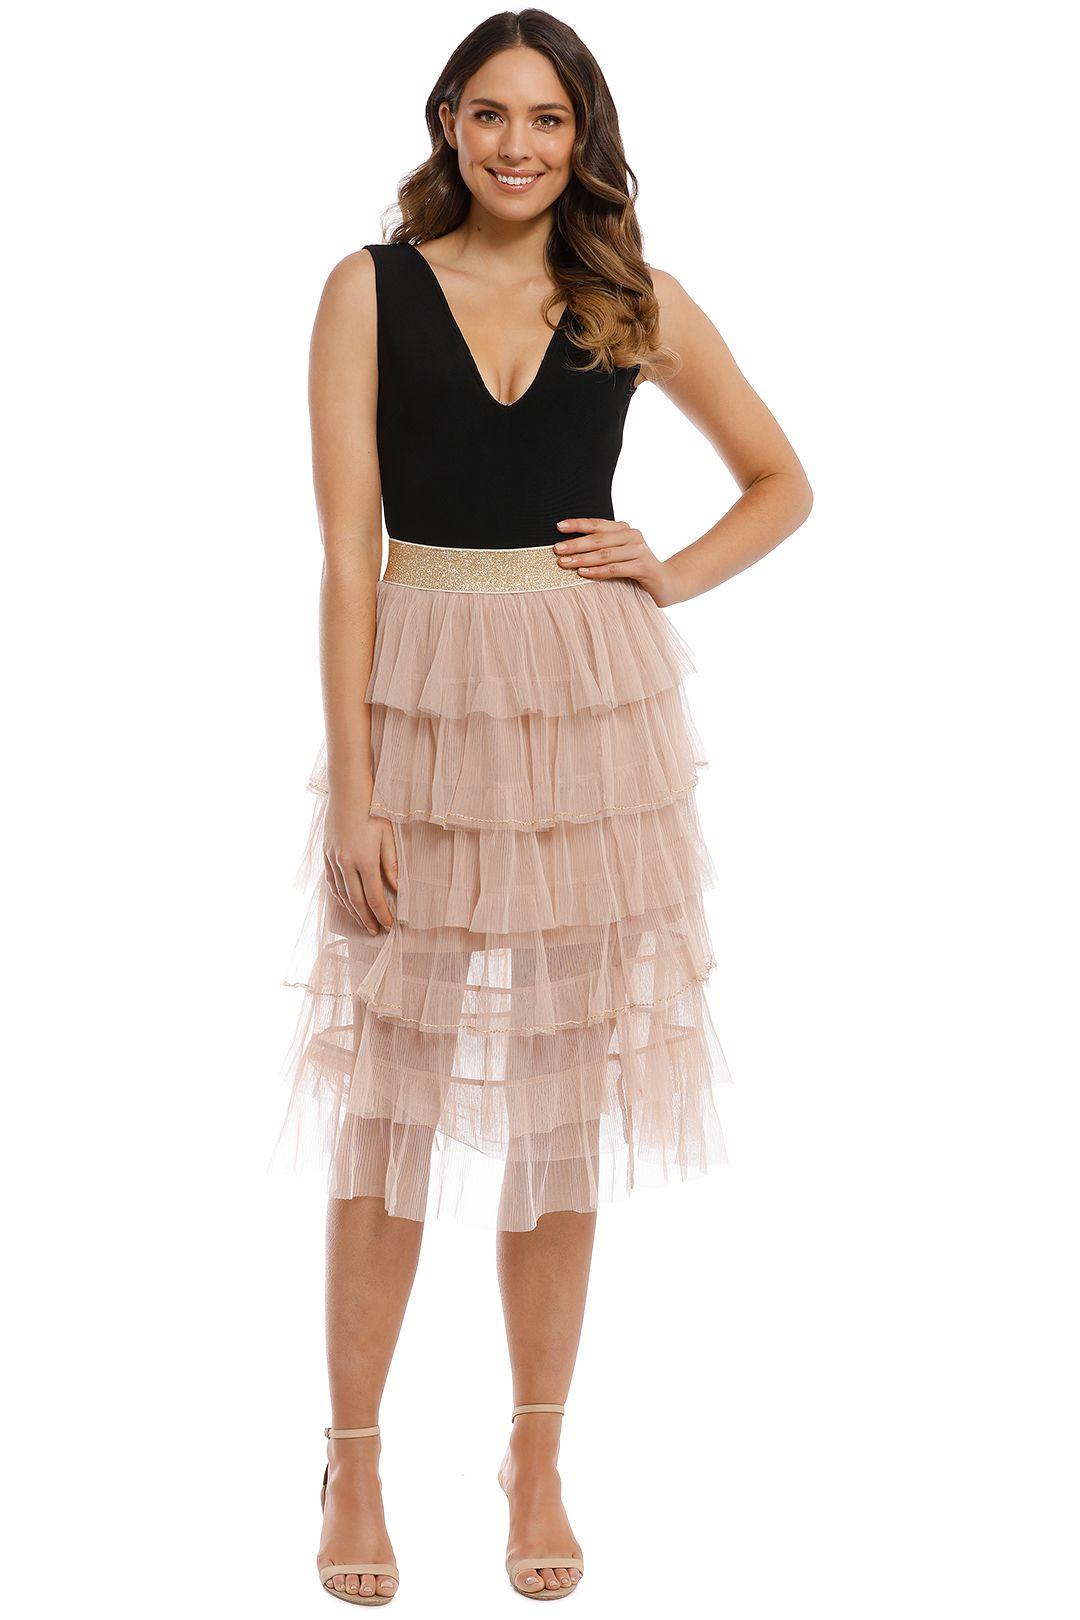 Trelise Cooper - Layer Upper Layer Skirt - Vintage Nude - Front